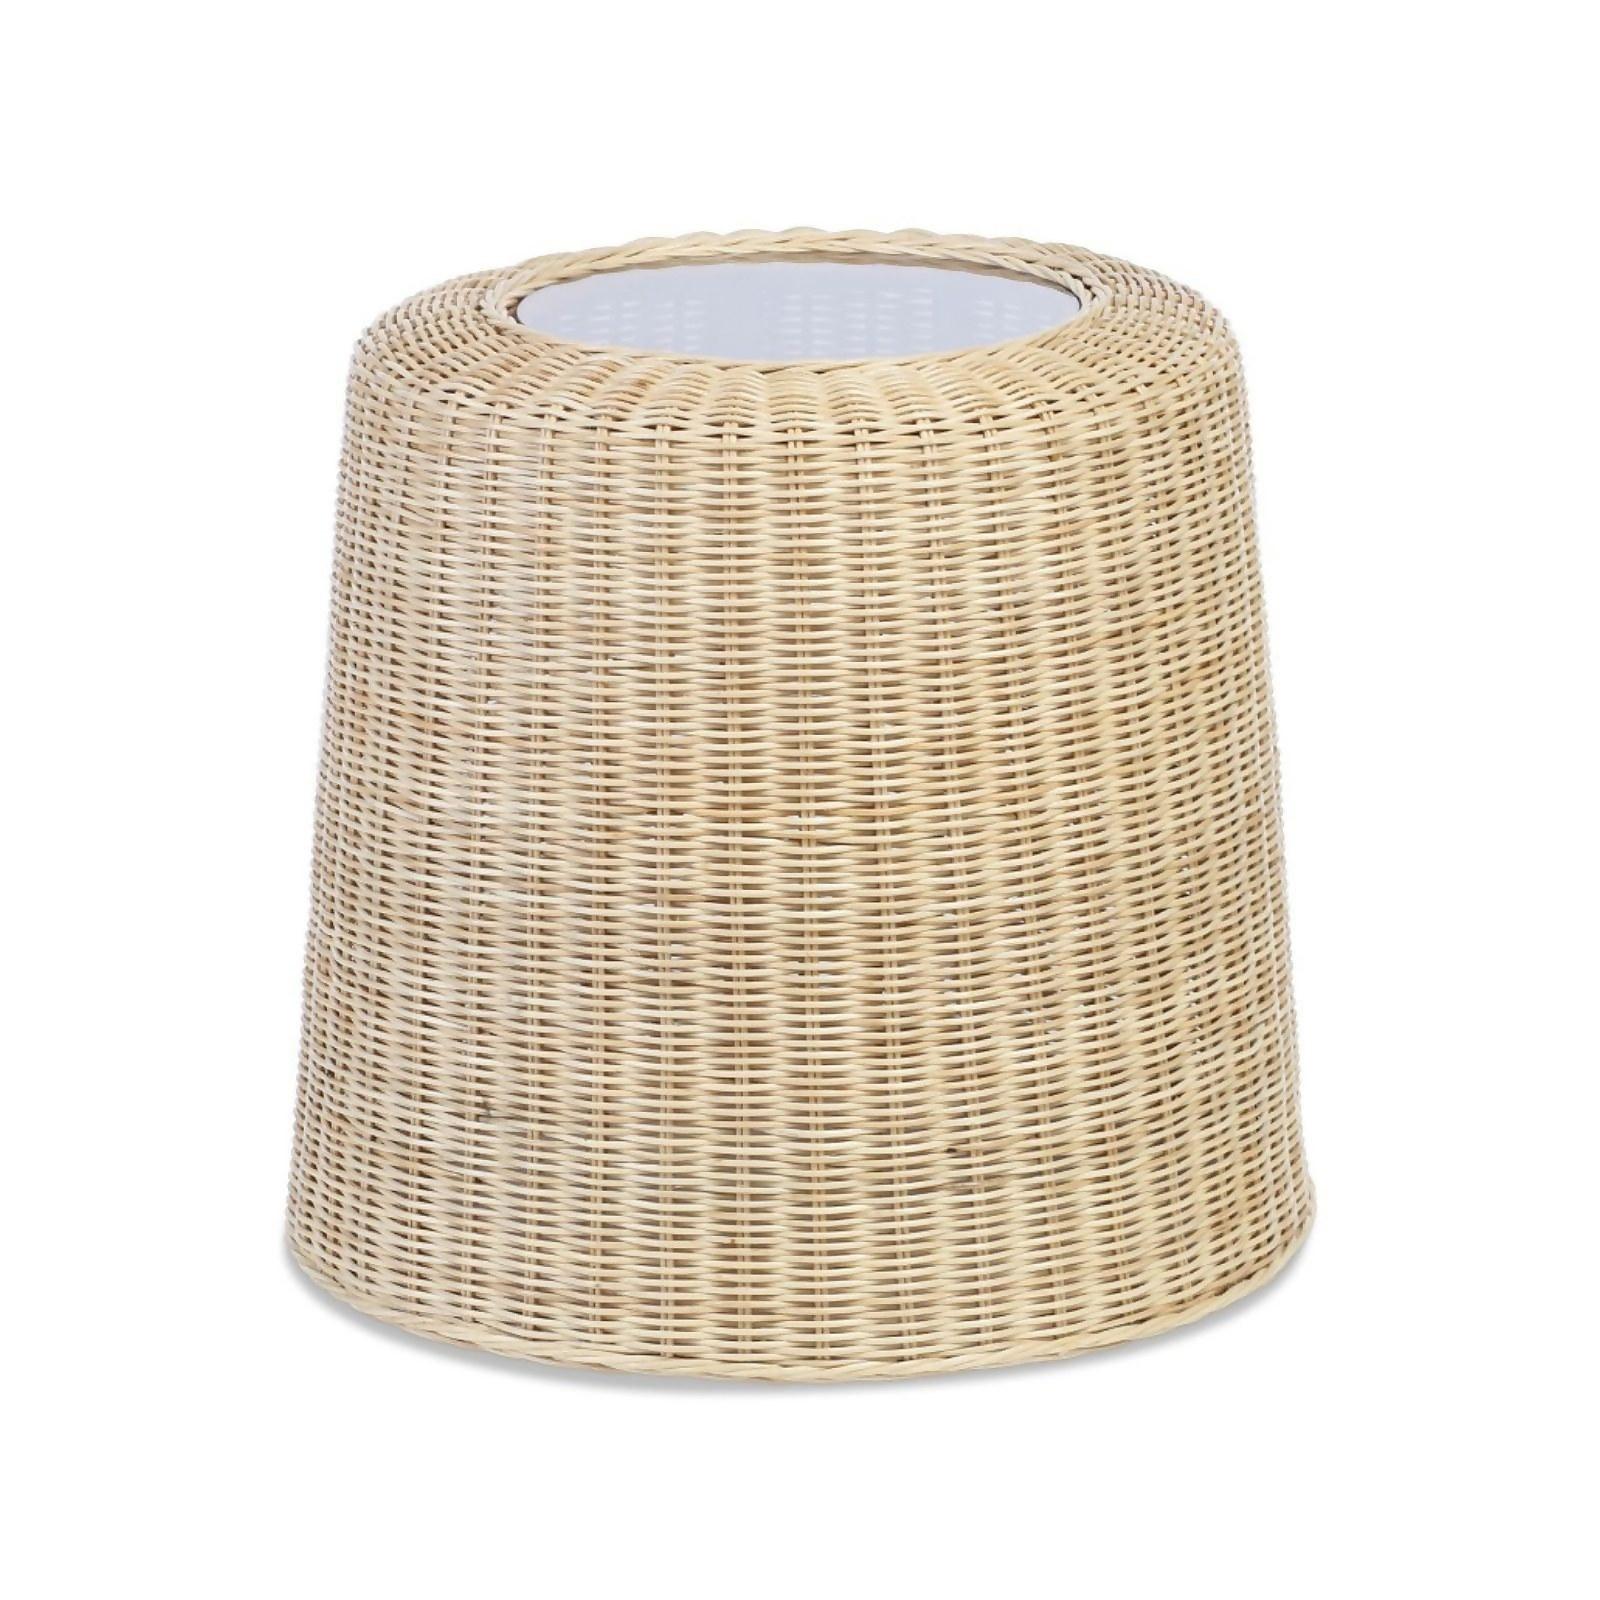 Woven Natural Rattan Lamp Table